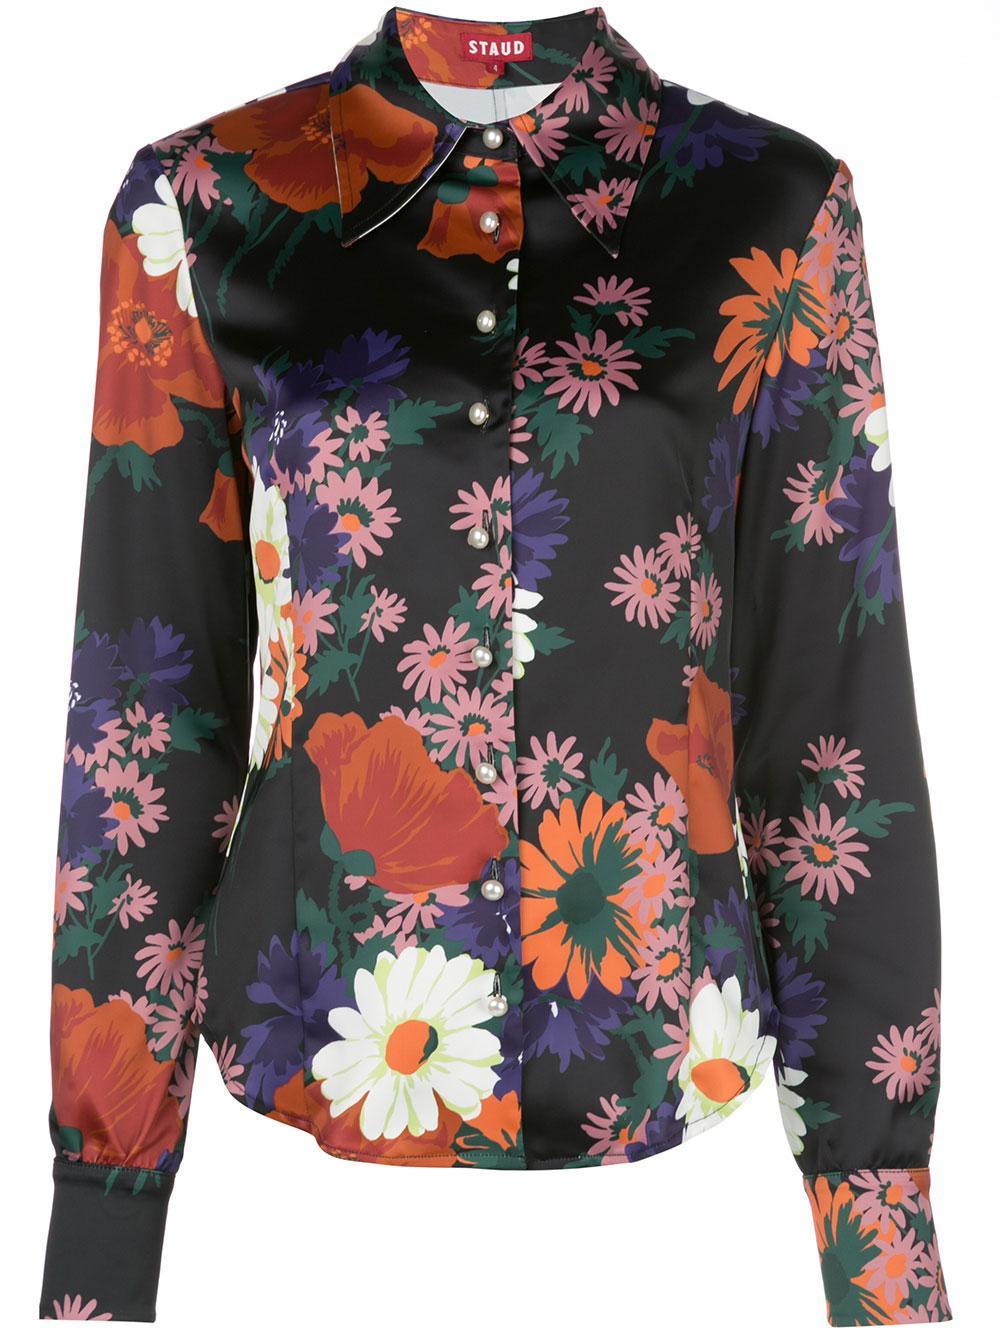 Hendrix Floral Top Item # 131-3102-BFLR